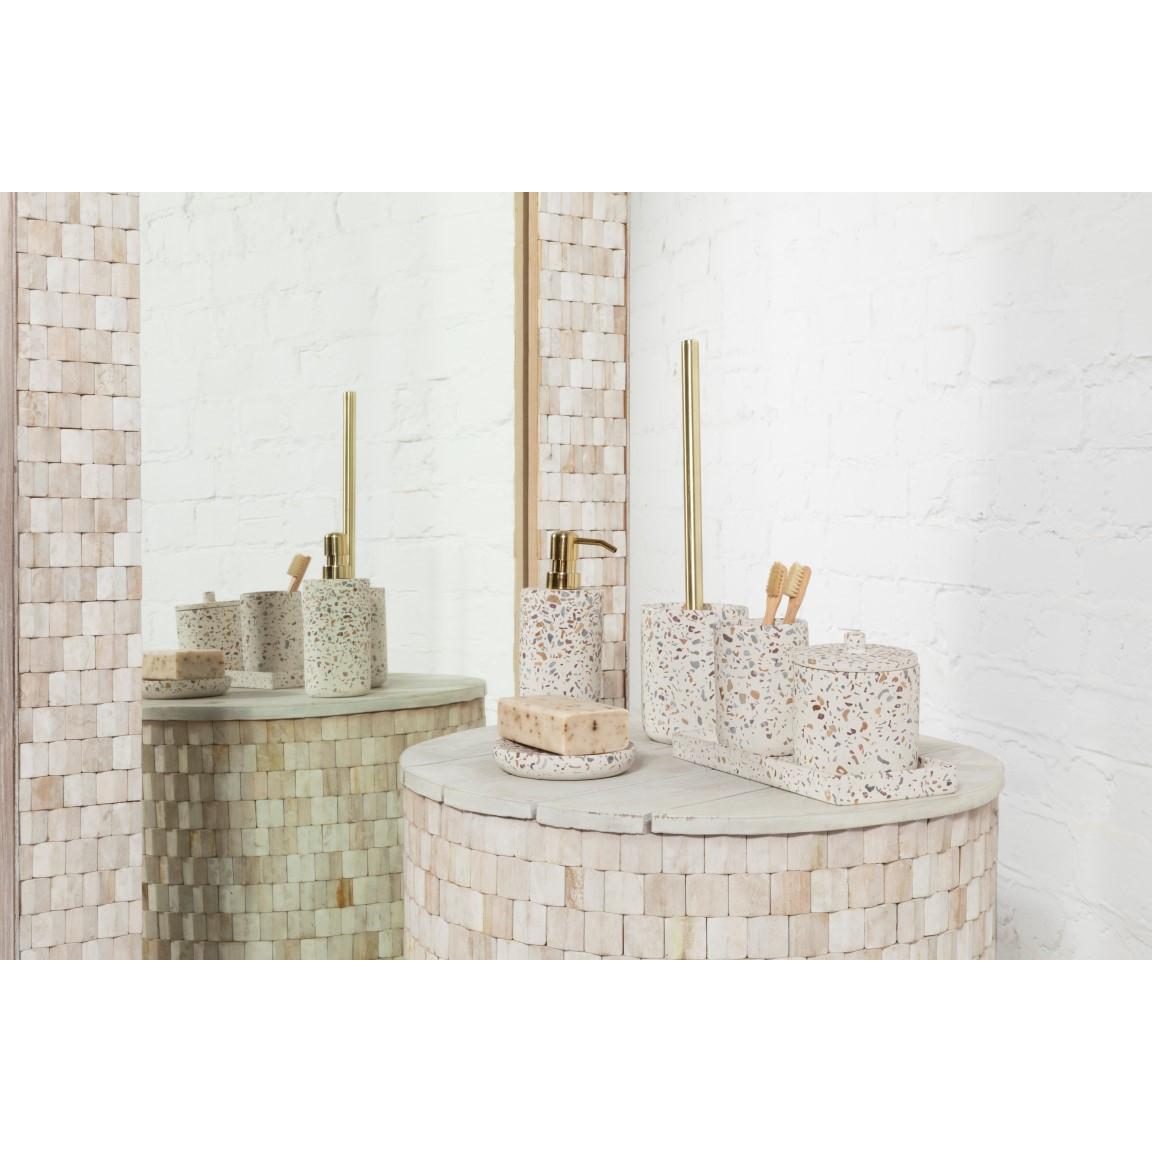 Toilet Brush with Holder Gozo